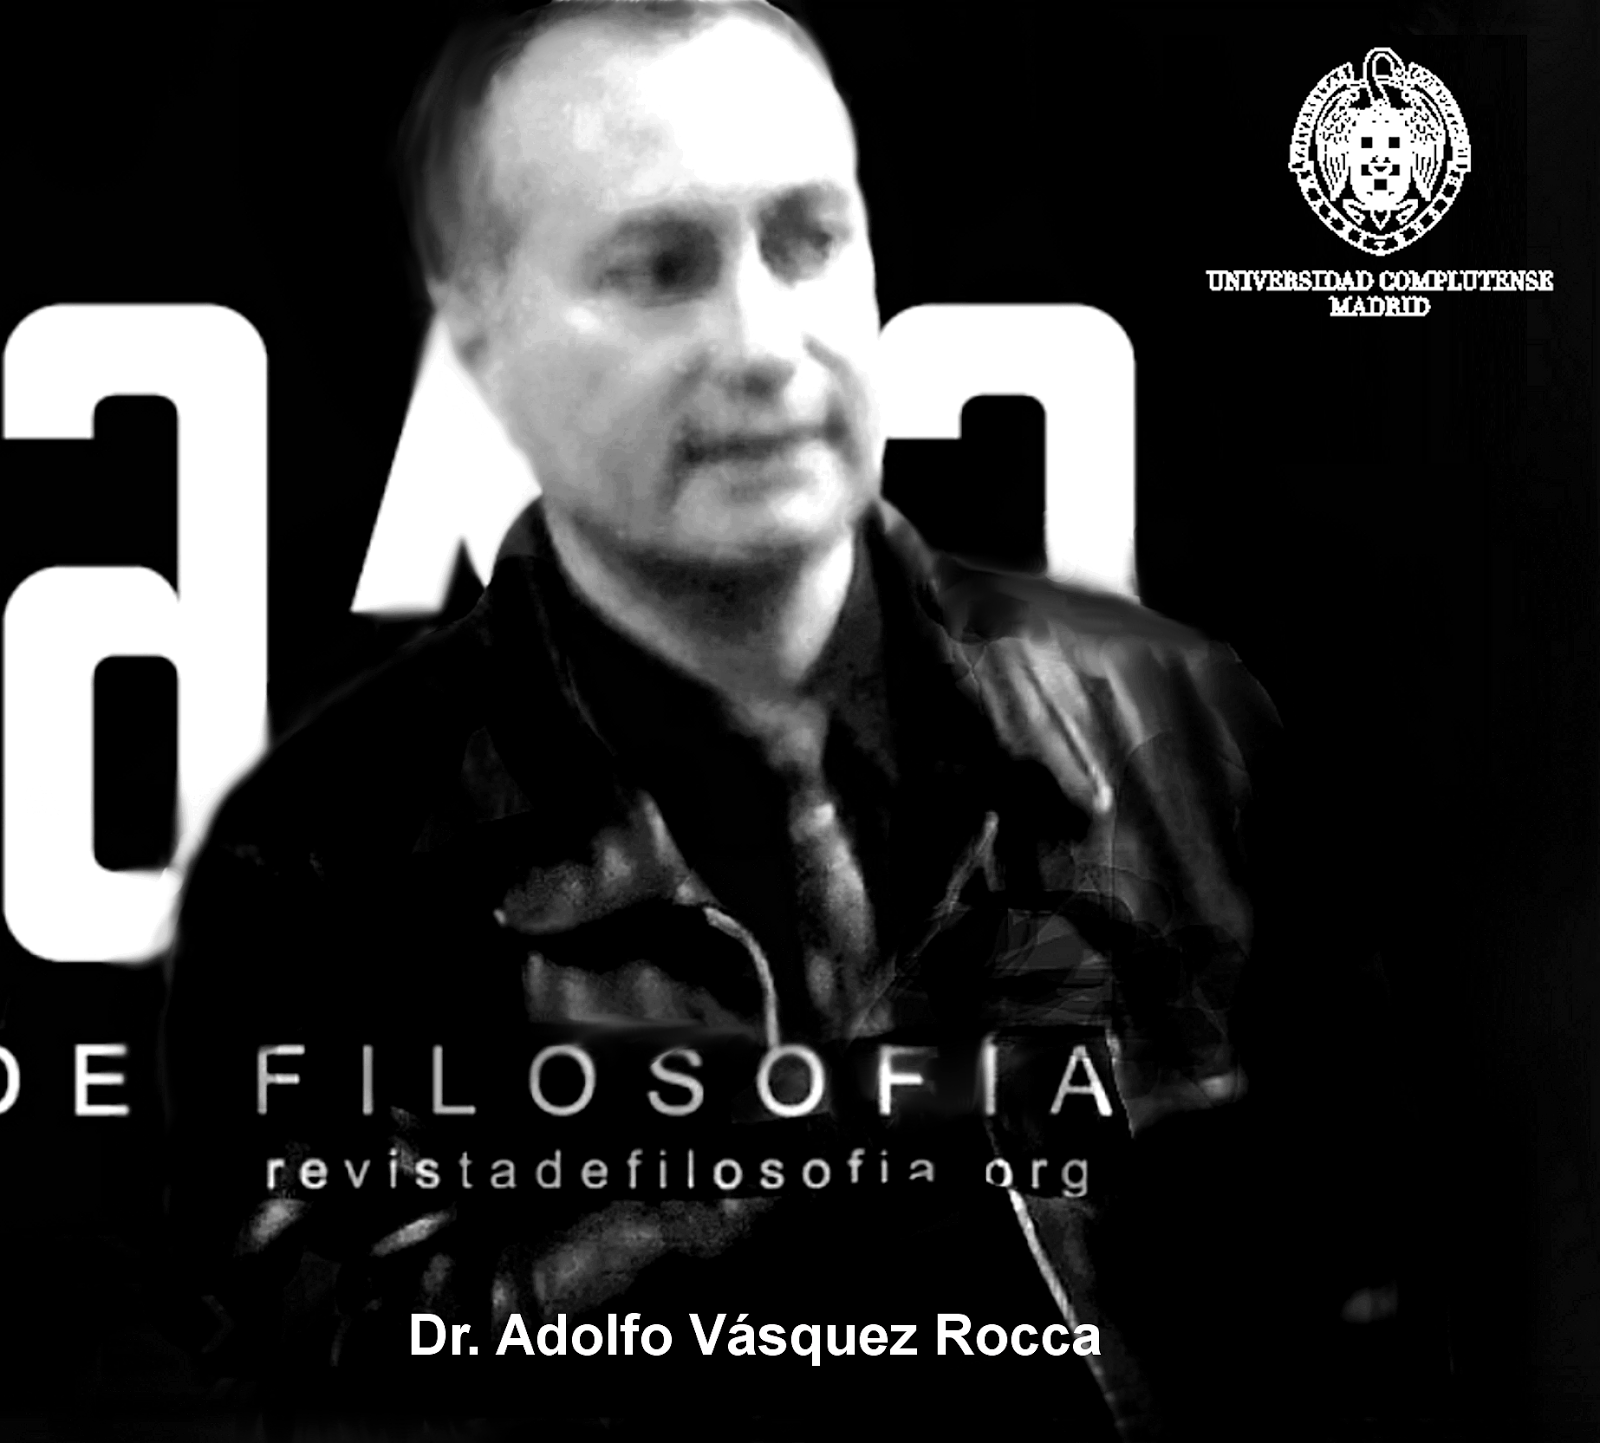 http://4.bp.blogspot.com/-O7THYjdi1Do/Up_6WHsJZJI/AAAAAAAAMMY/qXN2QihuilE/s1600/Adofo+Vasquez+Rocca++PHD.+2.0+bn+_+Revista+Eikasia+_+Sociedad+Asturiana+de+Filosof%C3%ADa+7000+BN+individual.png